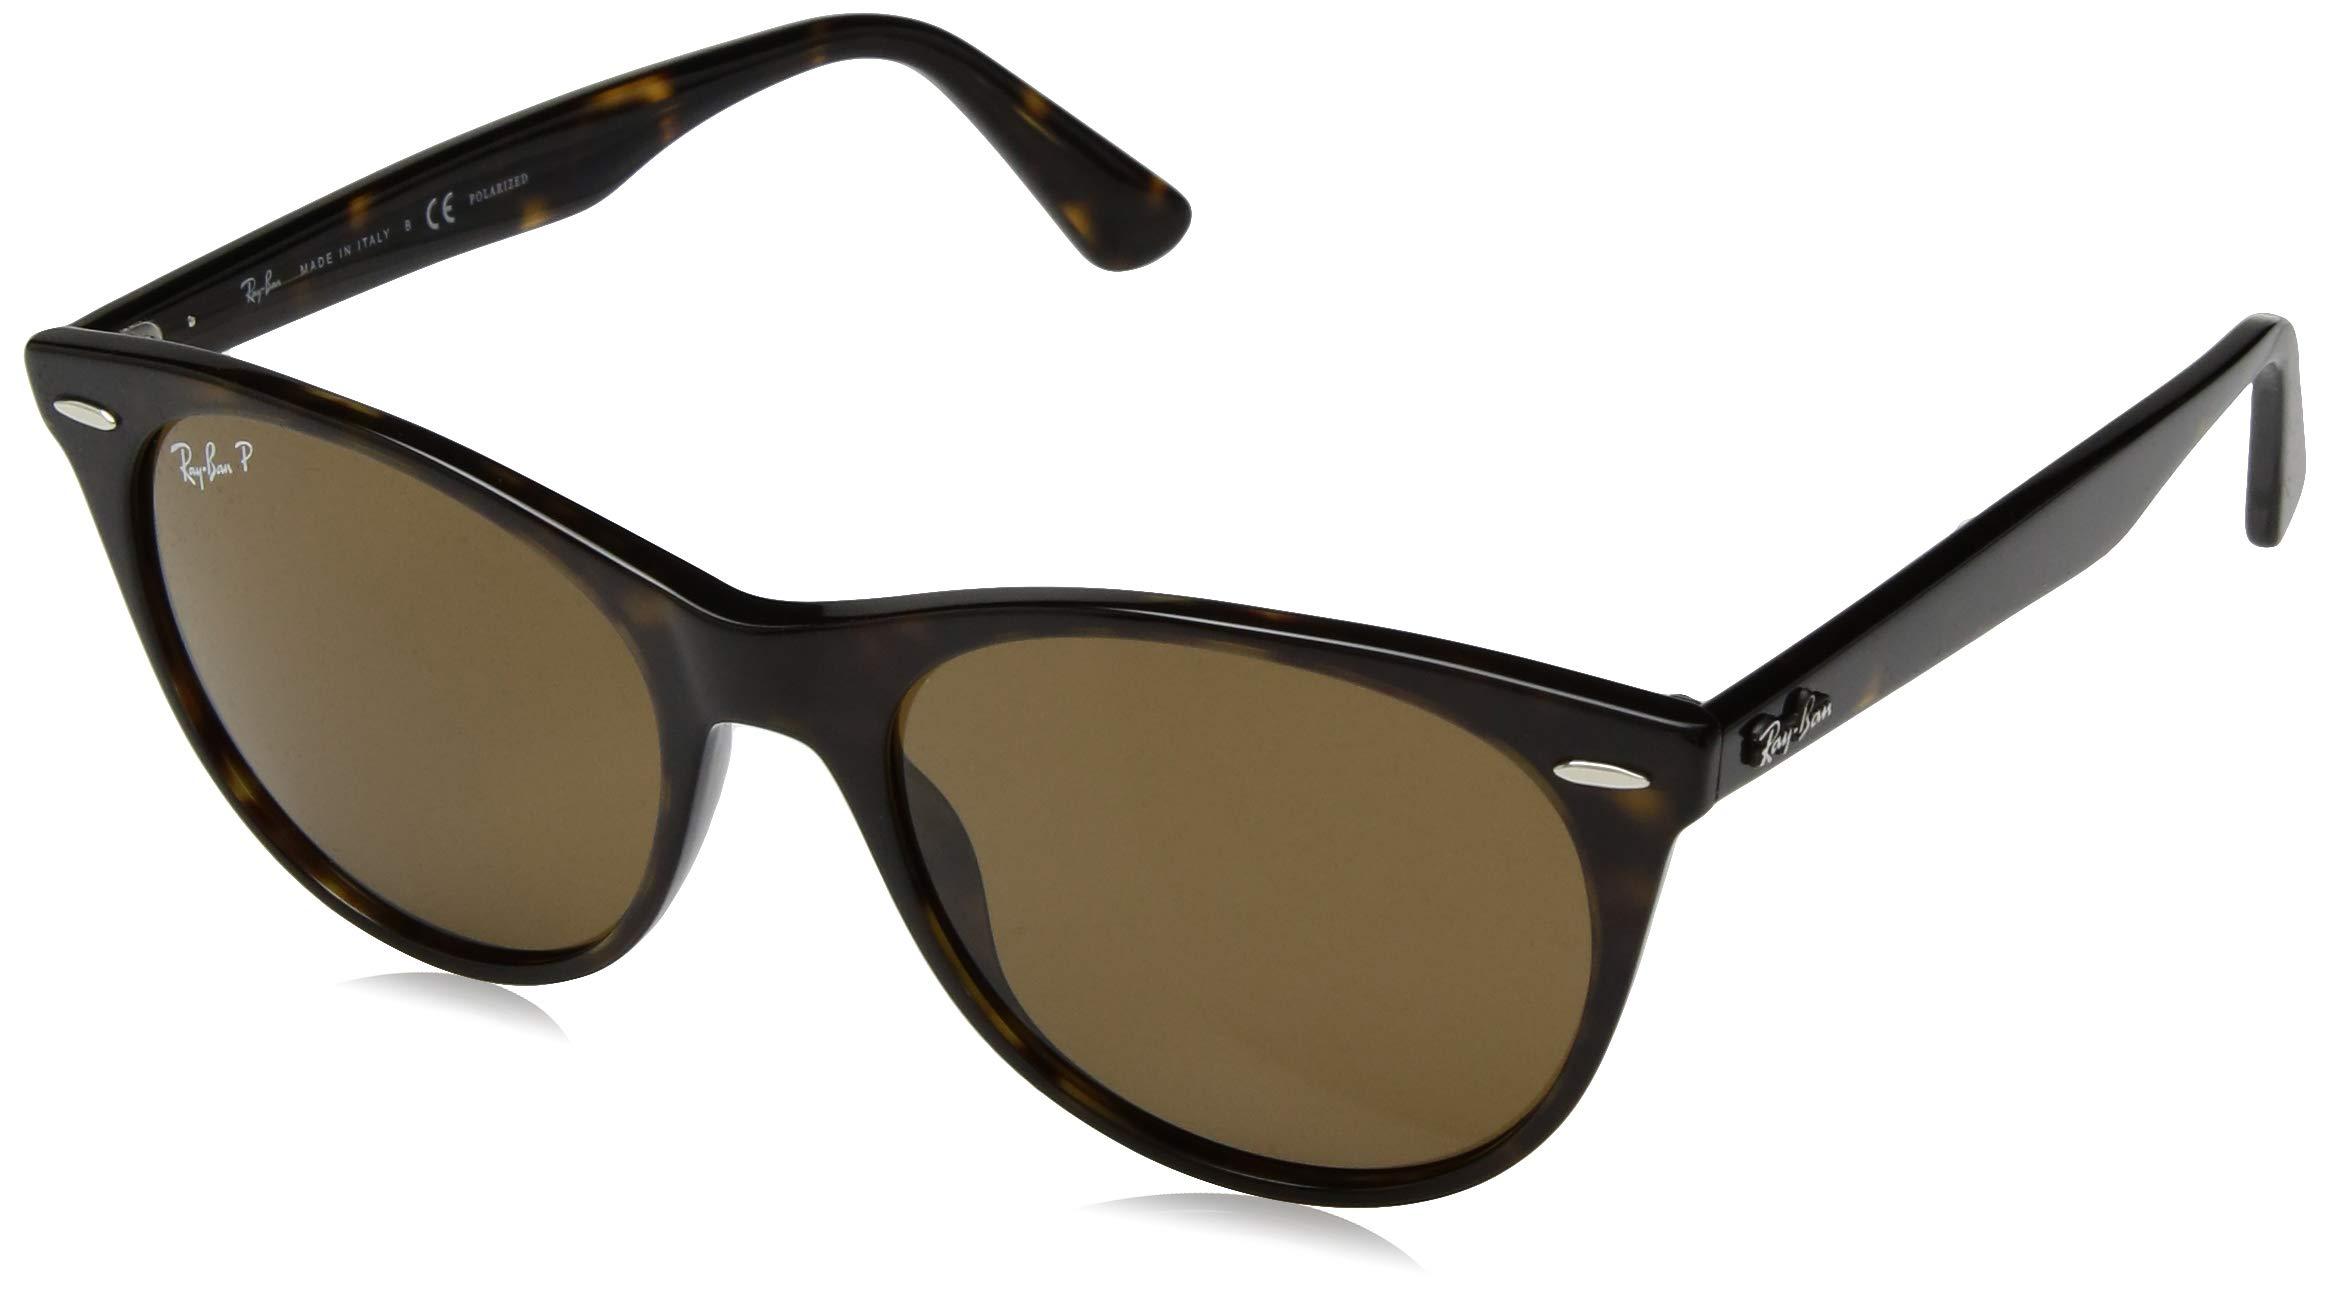 Ray-Ban RB2185 Wayfarer II Sunglasses, Striped Havana/Polarized Crystal Brown, 55 mm